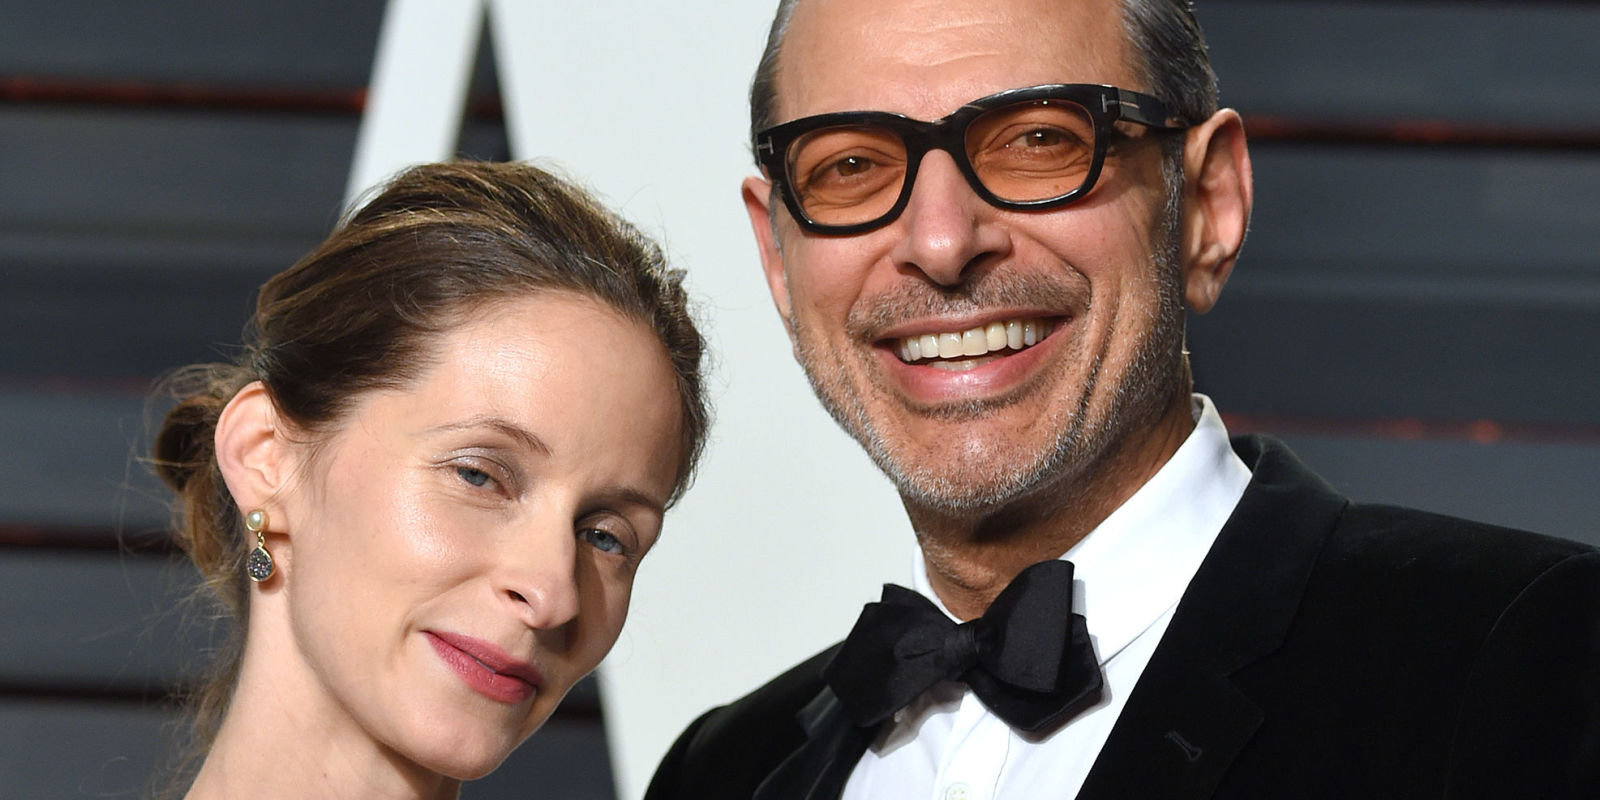 Jurassic Park's Jeff Goldblum Is A Daddy Again At 64